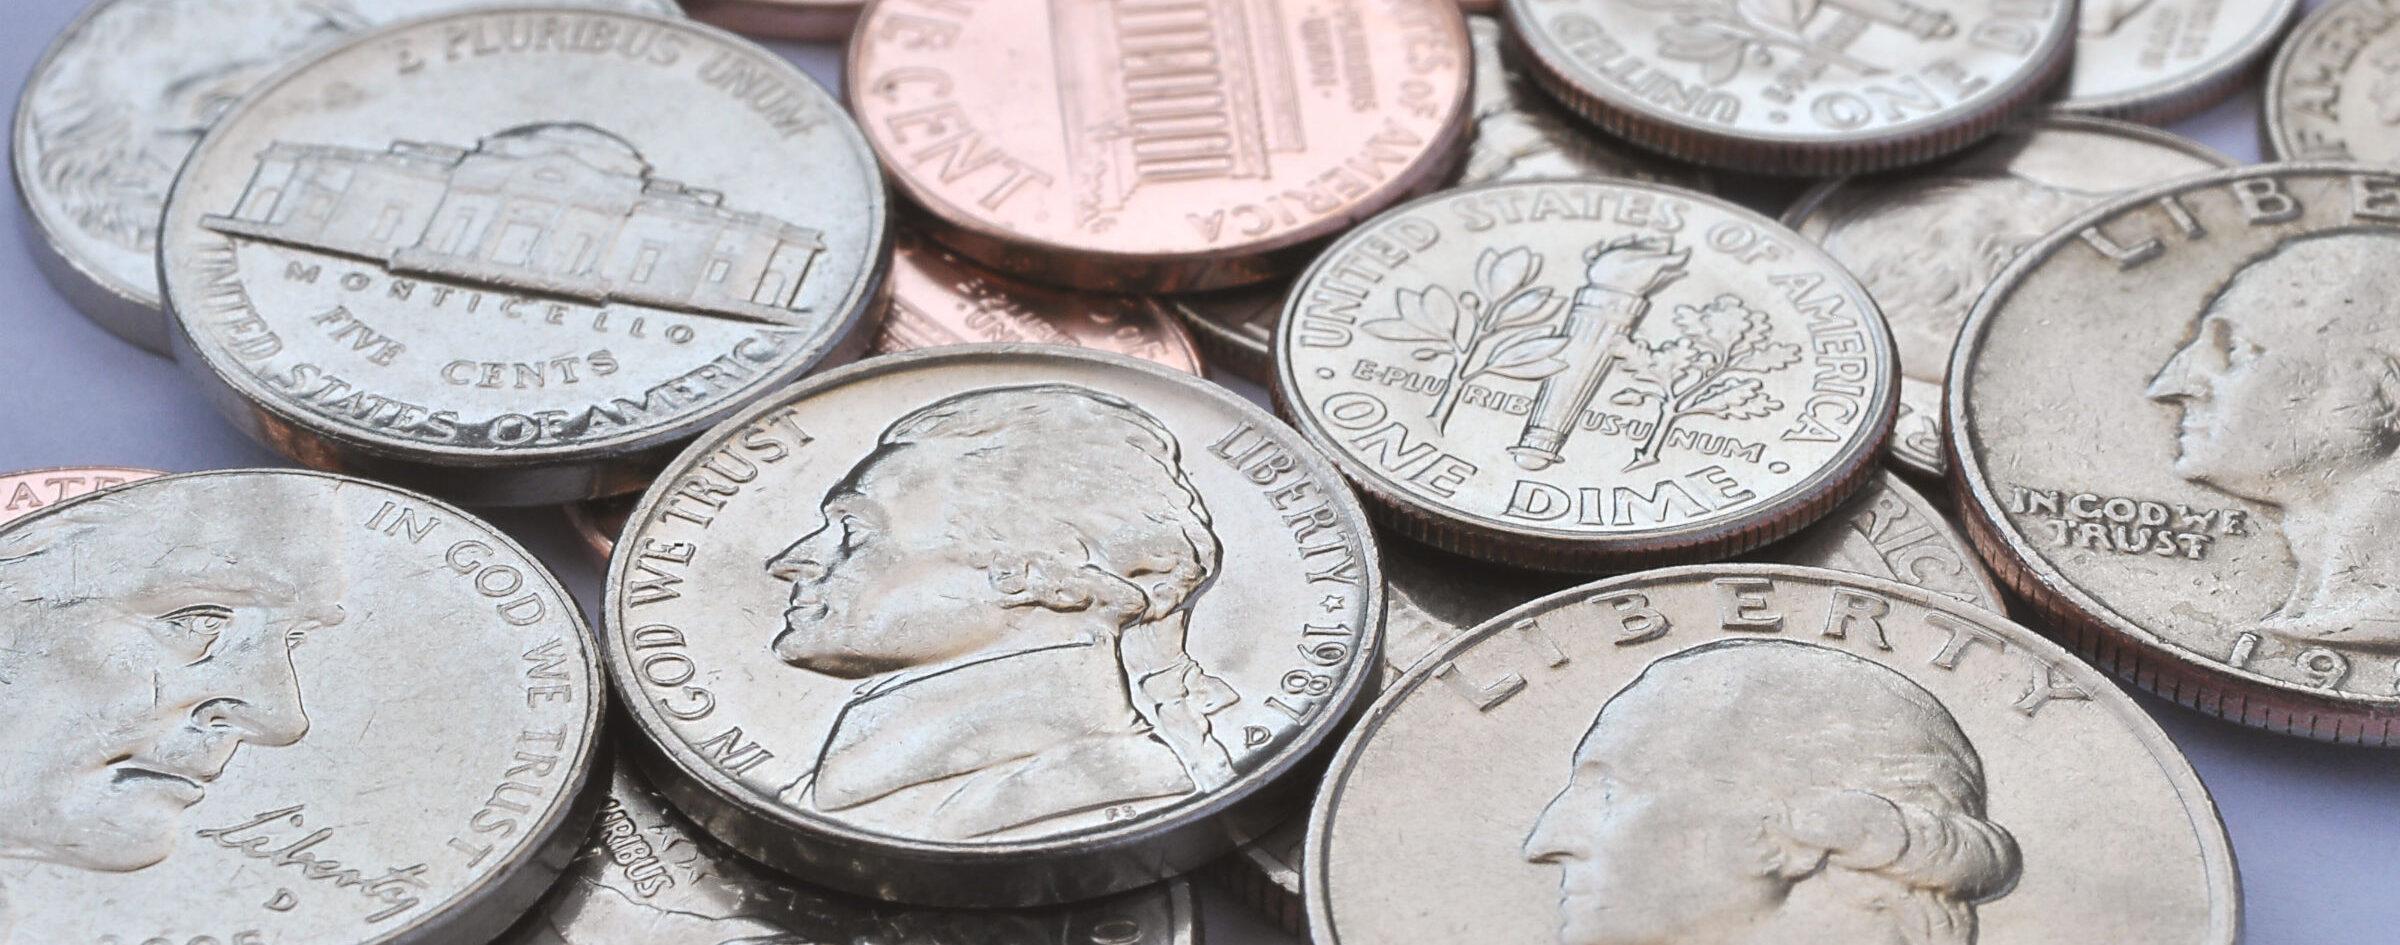 coins array